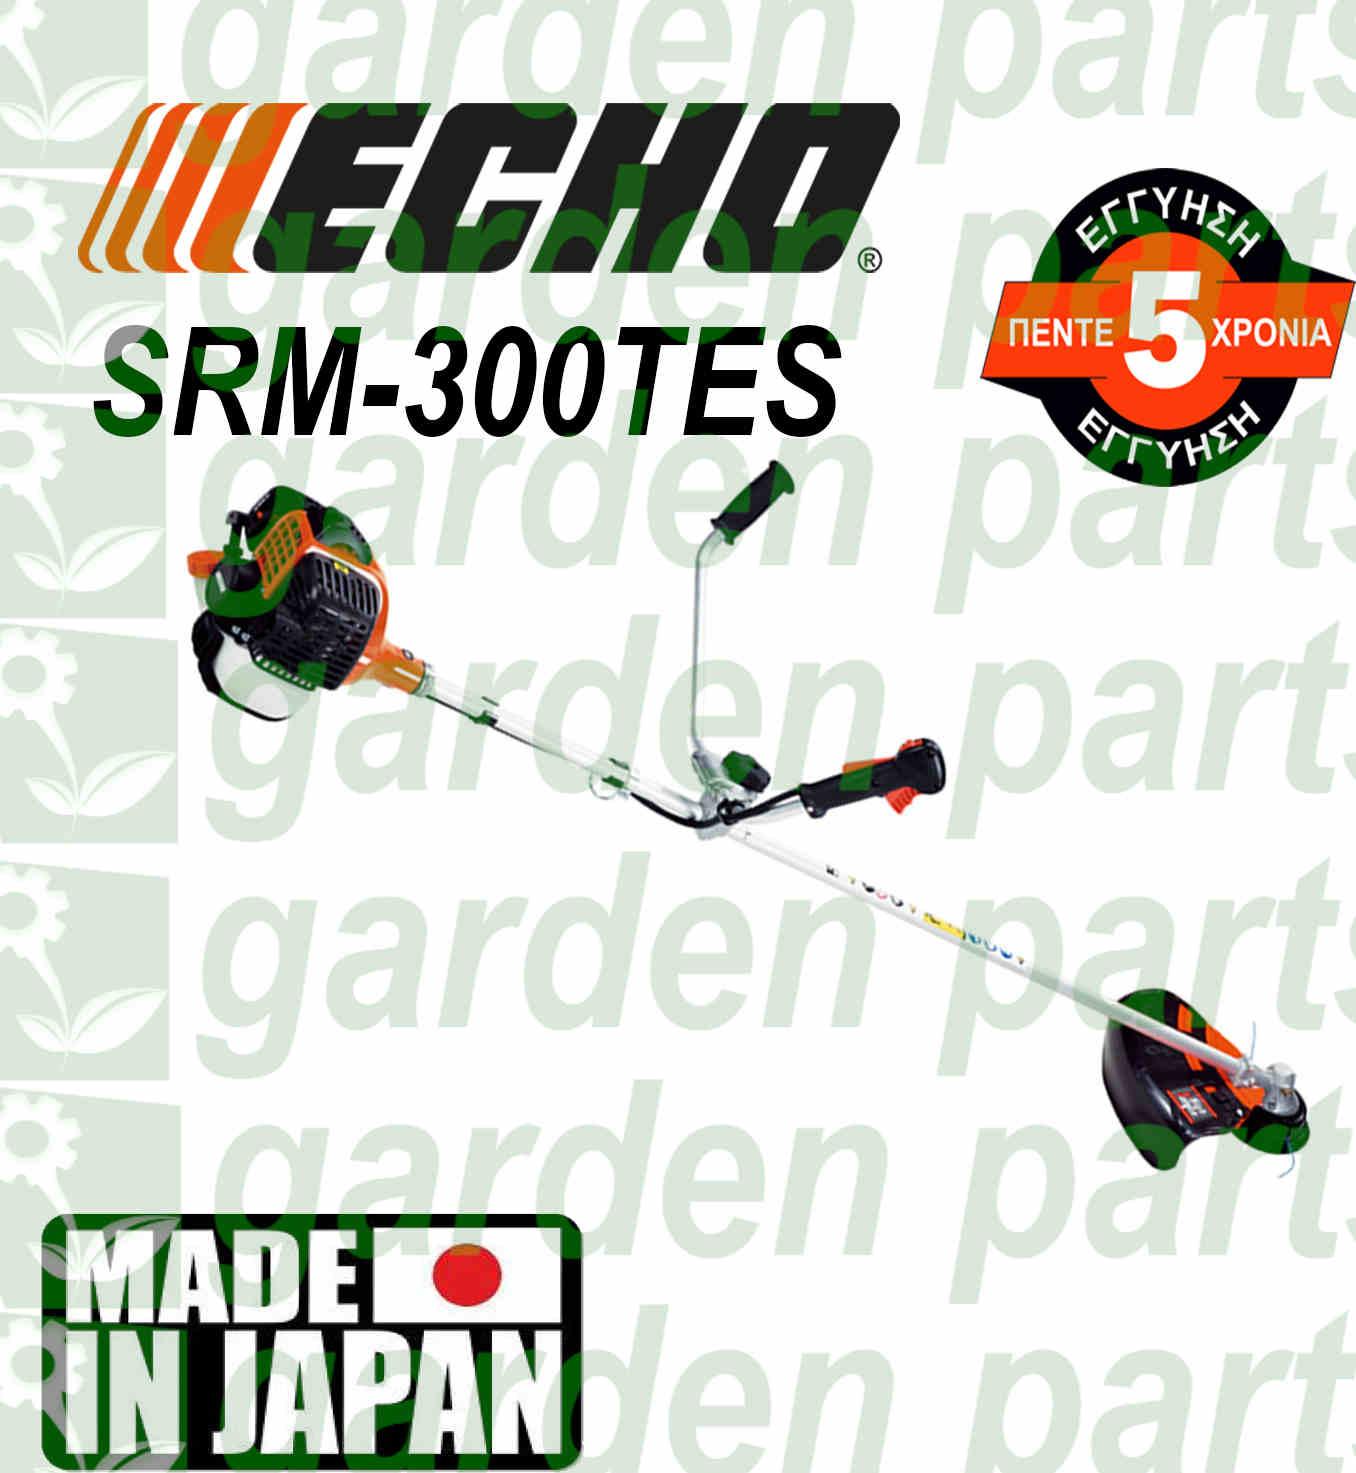 Echo SRM-300TES OFFERS